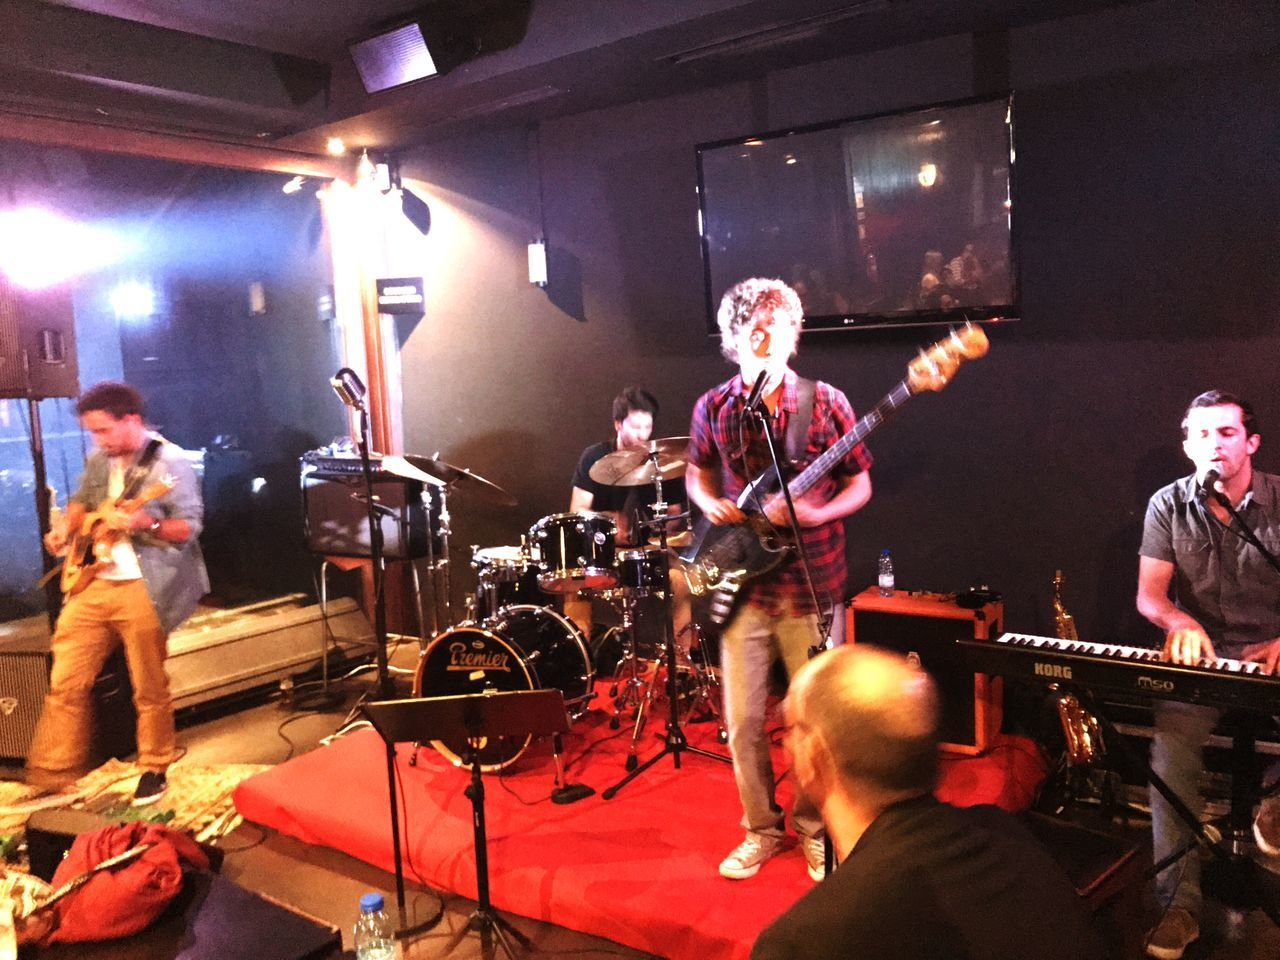 TASTY Music Musical Instrument Night Performance Group Musician